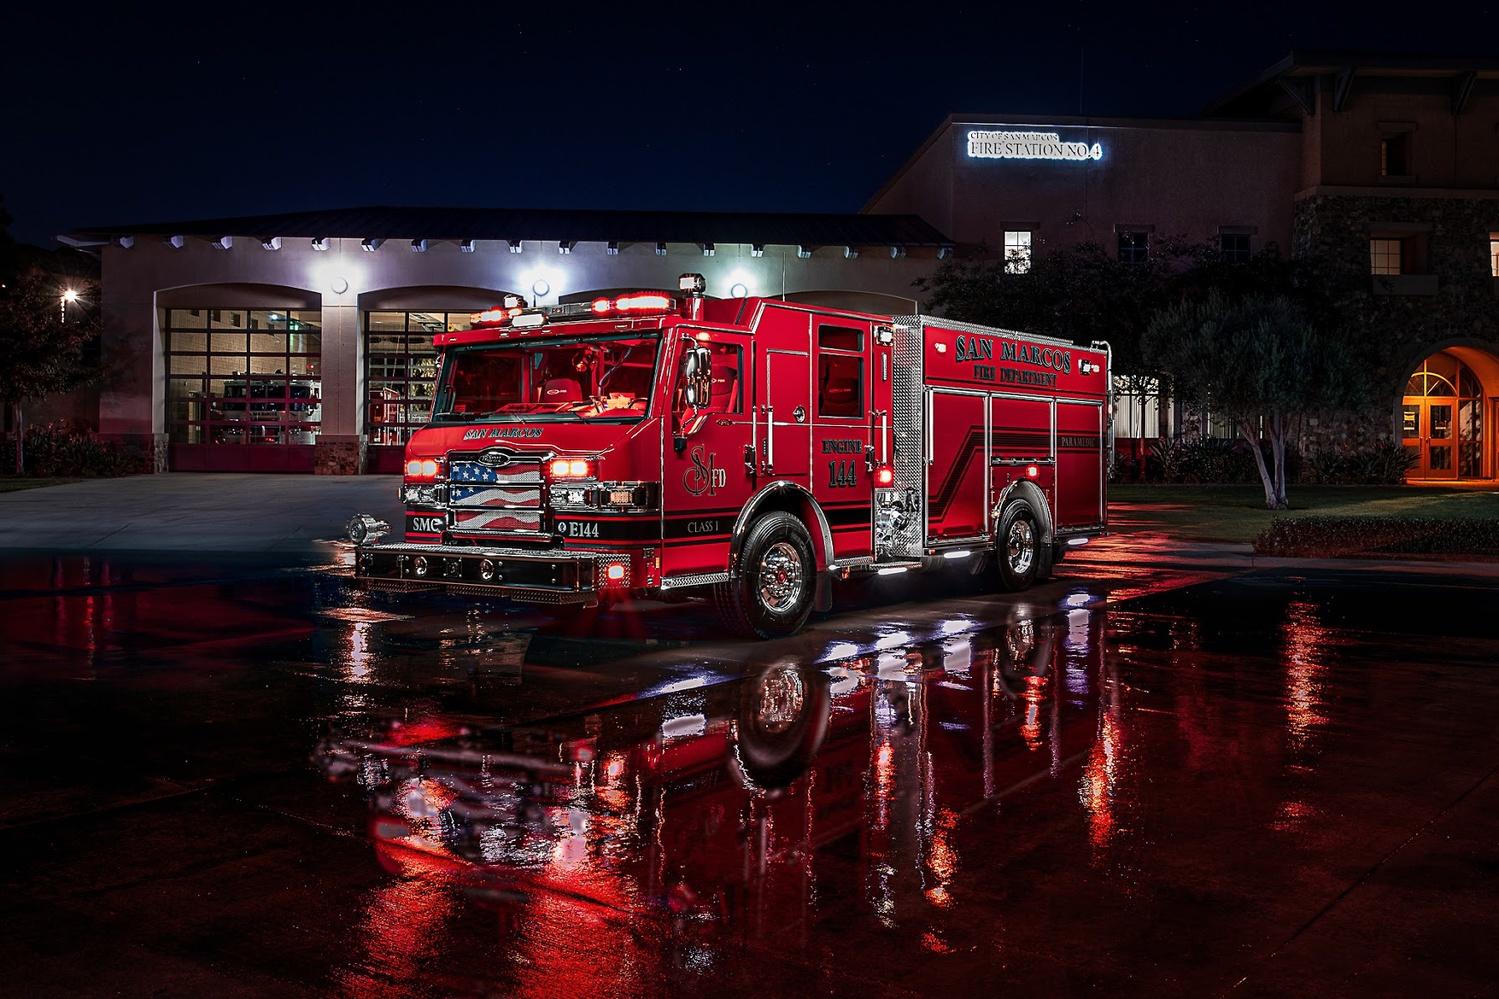 San Marcos FD Engine 4 by Creigh McIntyre